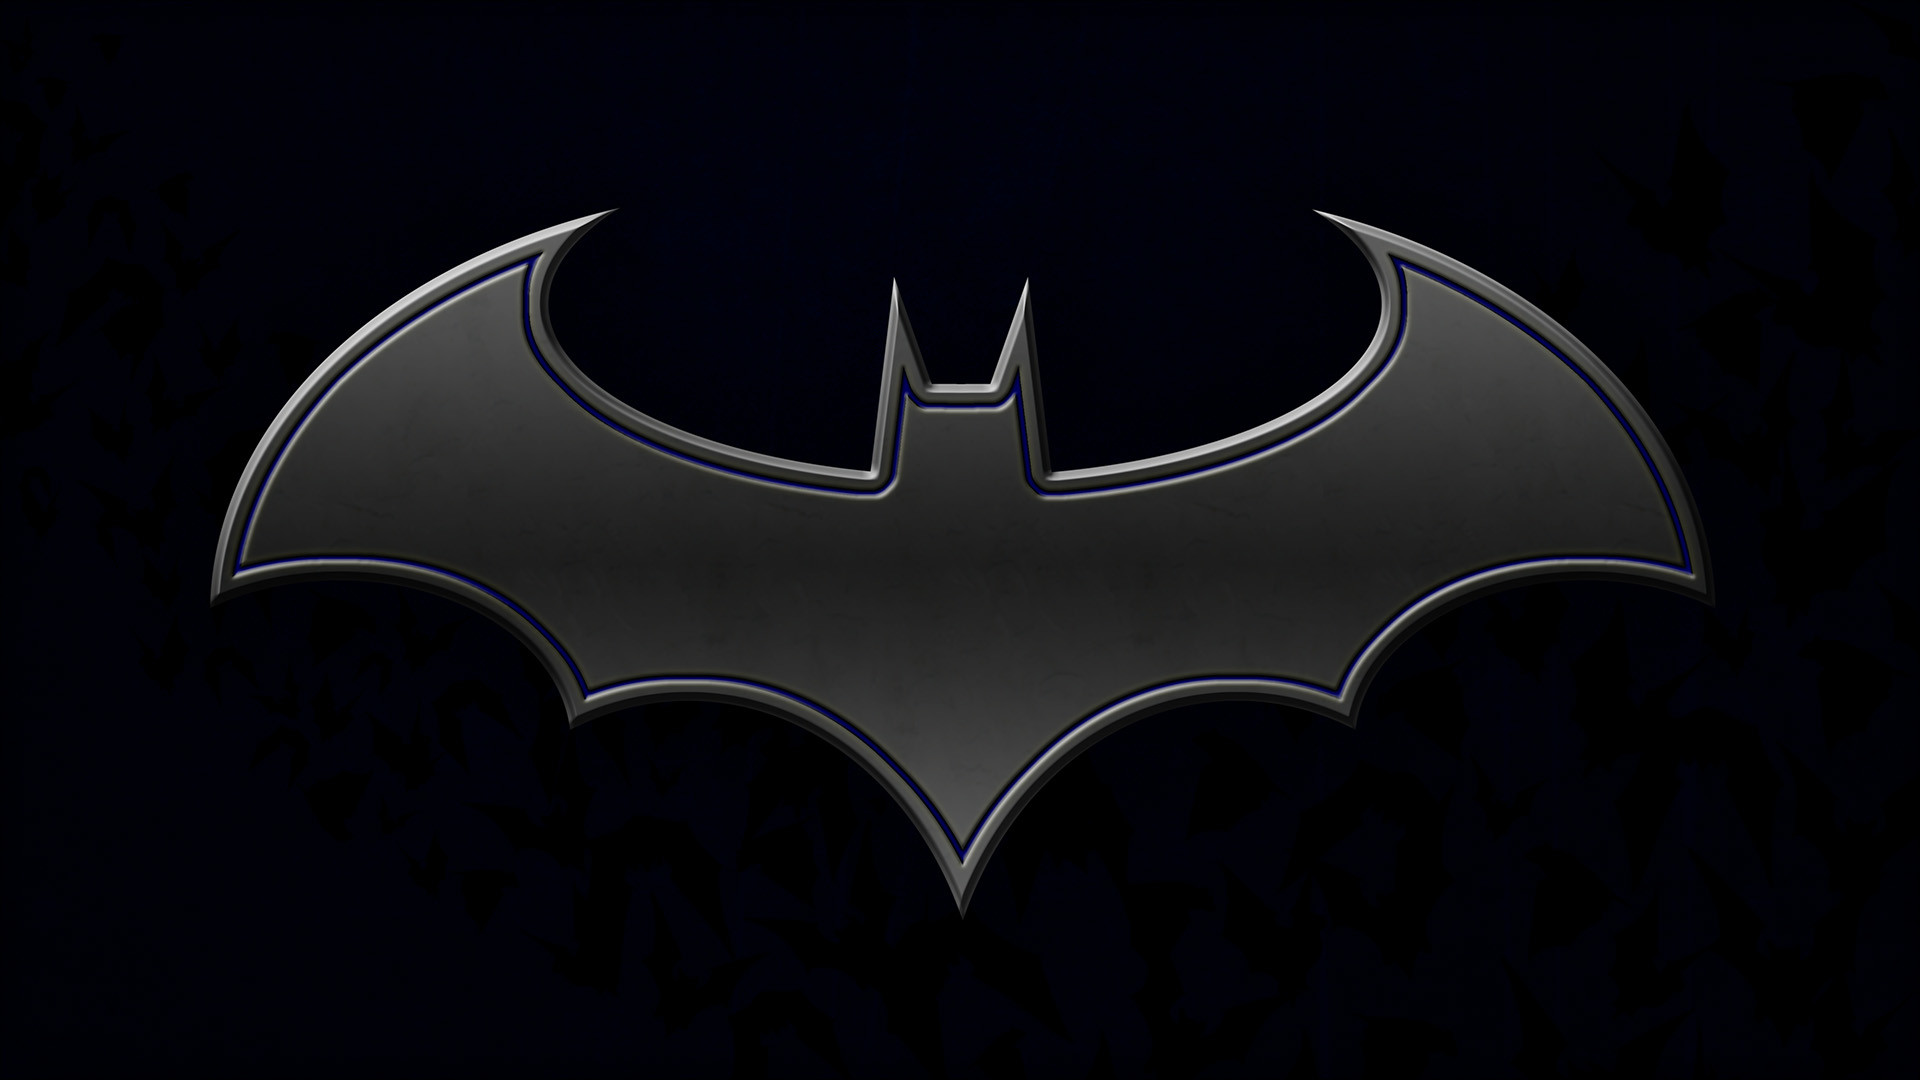 1920x1200 Batman Wallpapers Widescreen